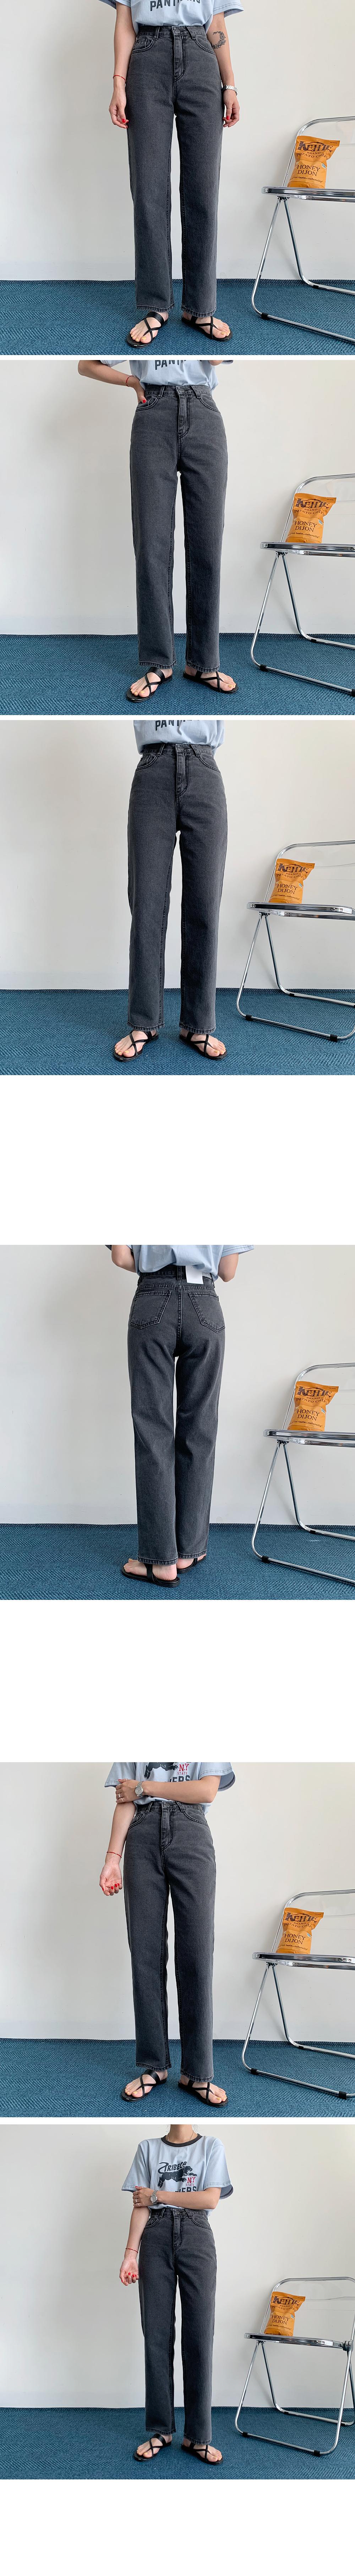 Leeds Black Blue Denim Pants